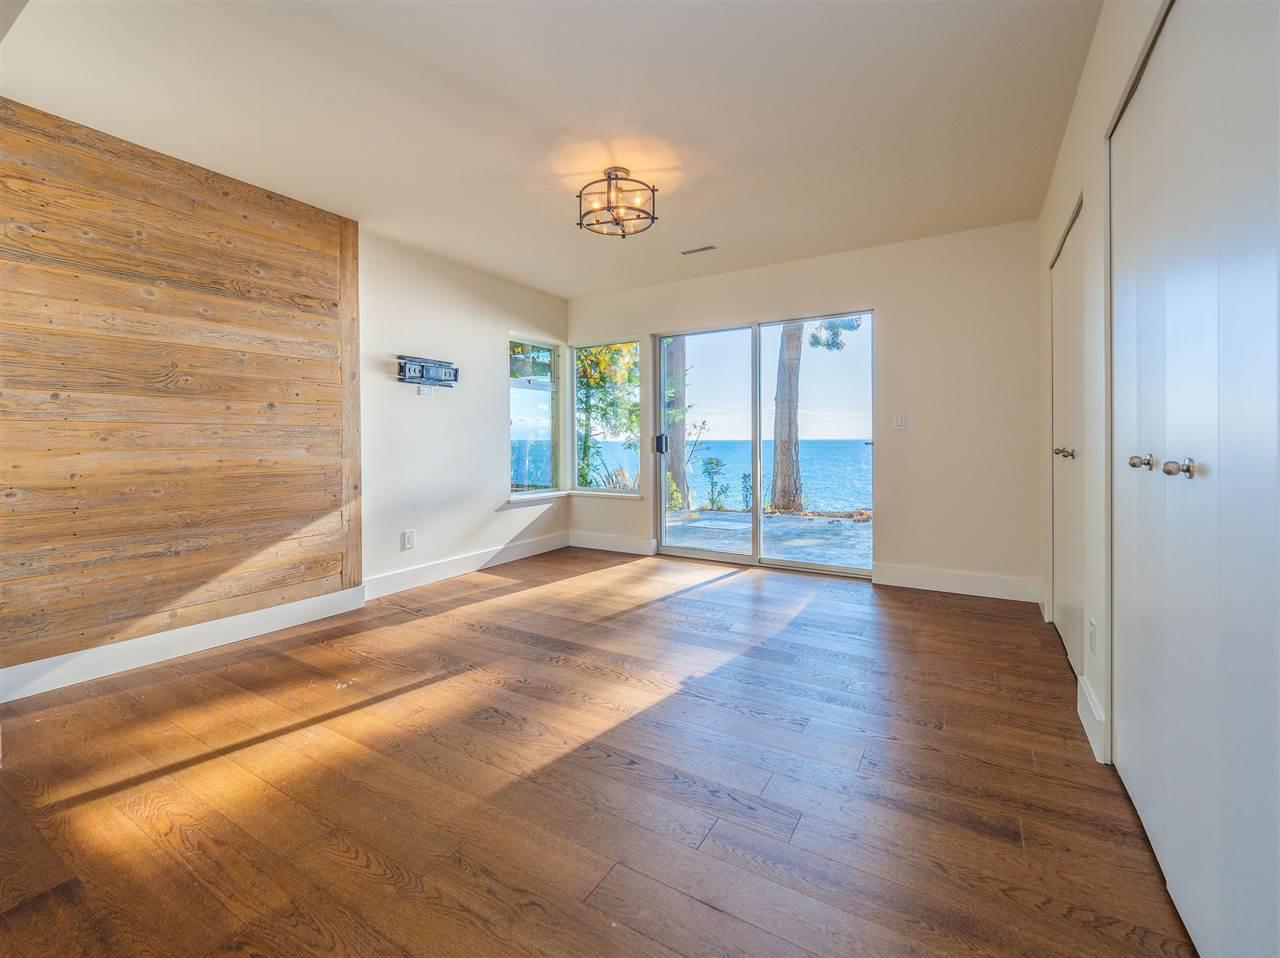 "Photo 32: Photos: 7101 DALE Road in Sechelt: Sechelt District House for sale in ""Caleda Estates"" (Sunshine Coast)  : MLS®# R2515160"